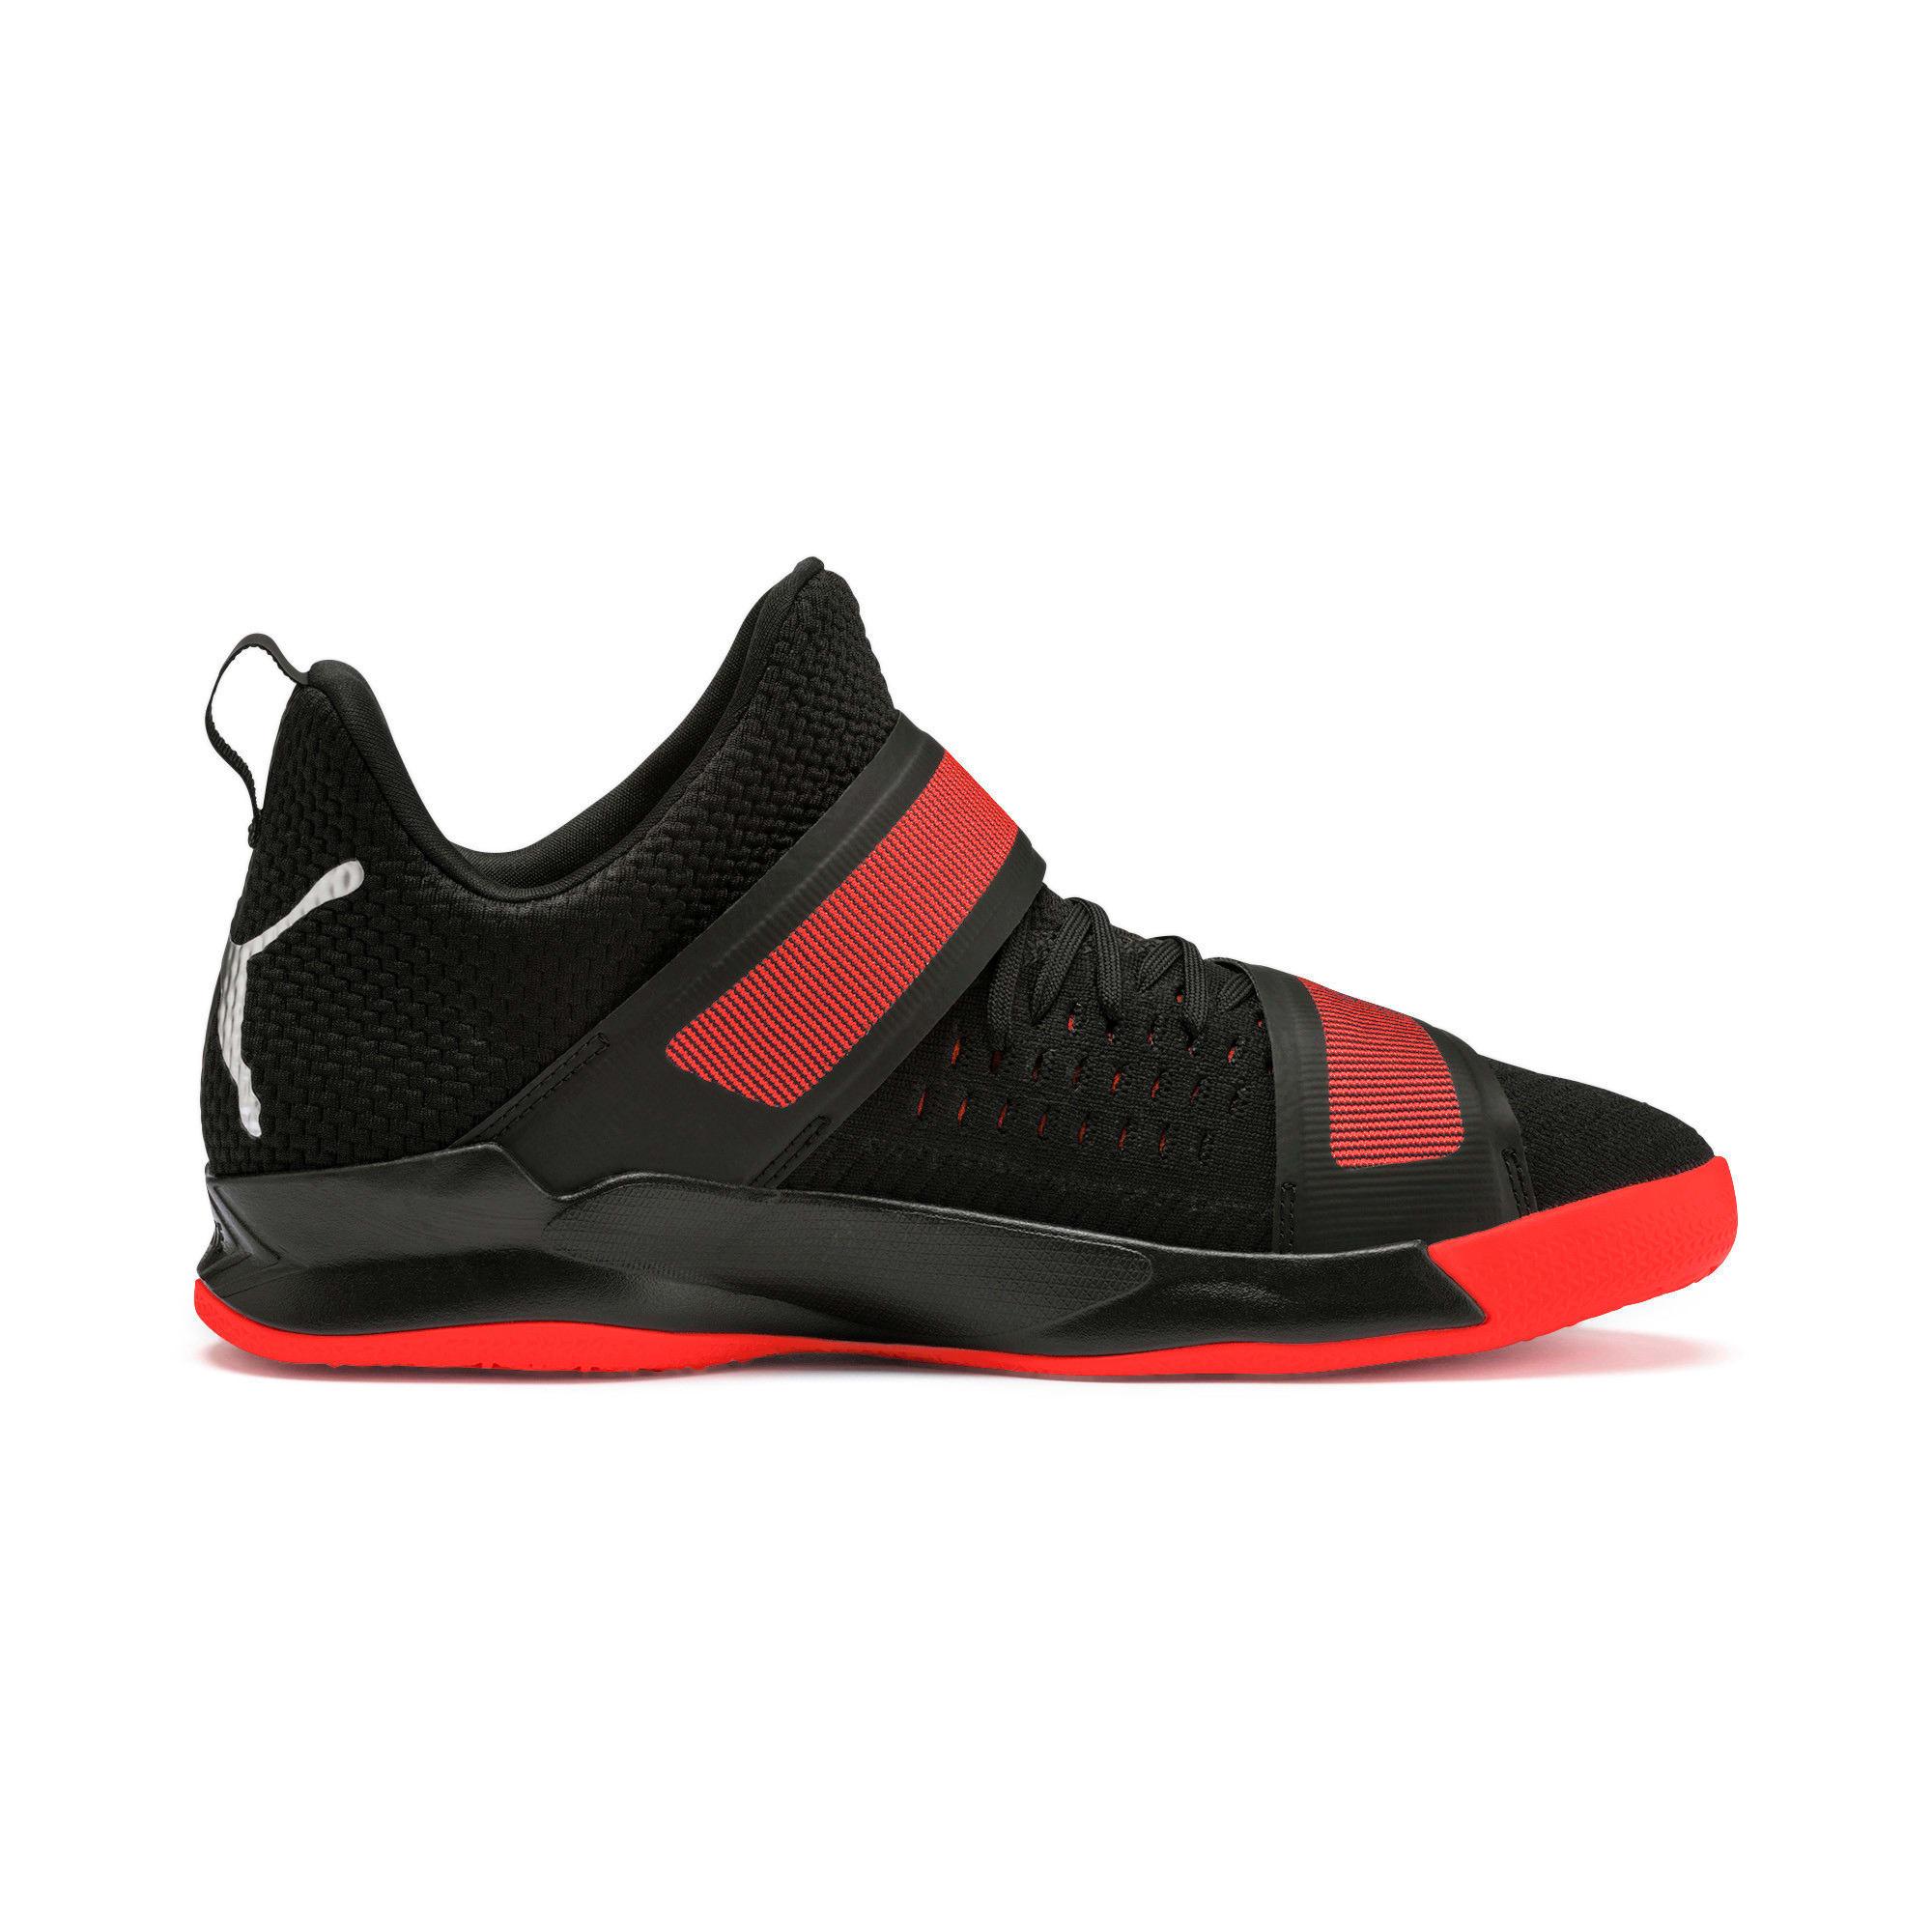 Thumbnail 6 of Rise XT3 NETFIT Handball Shoes, Puma Black-Silver-Nrgy Red, medium